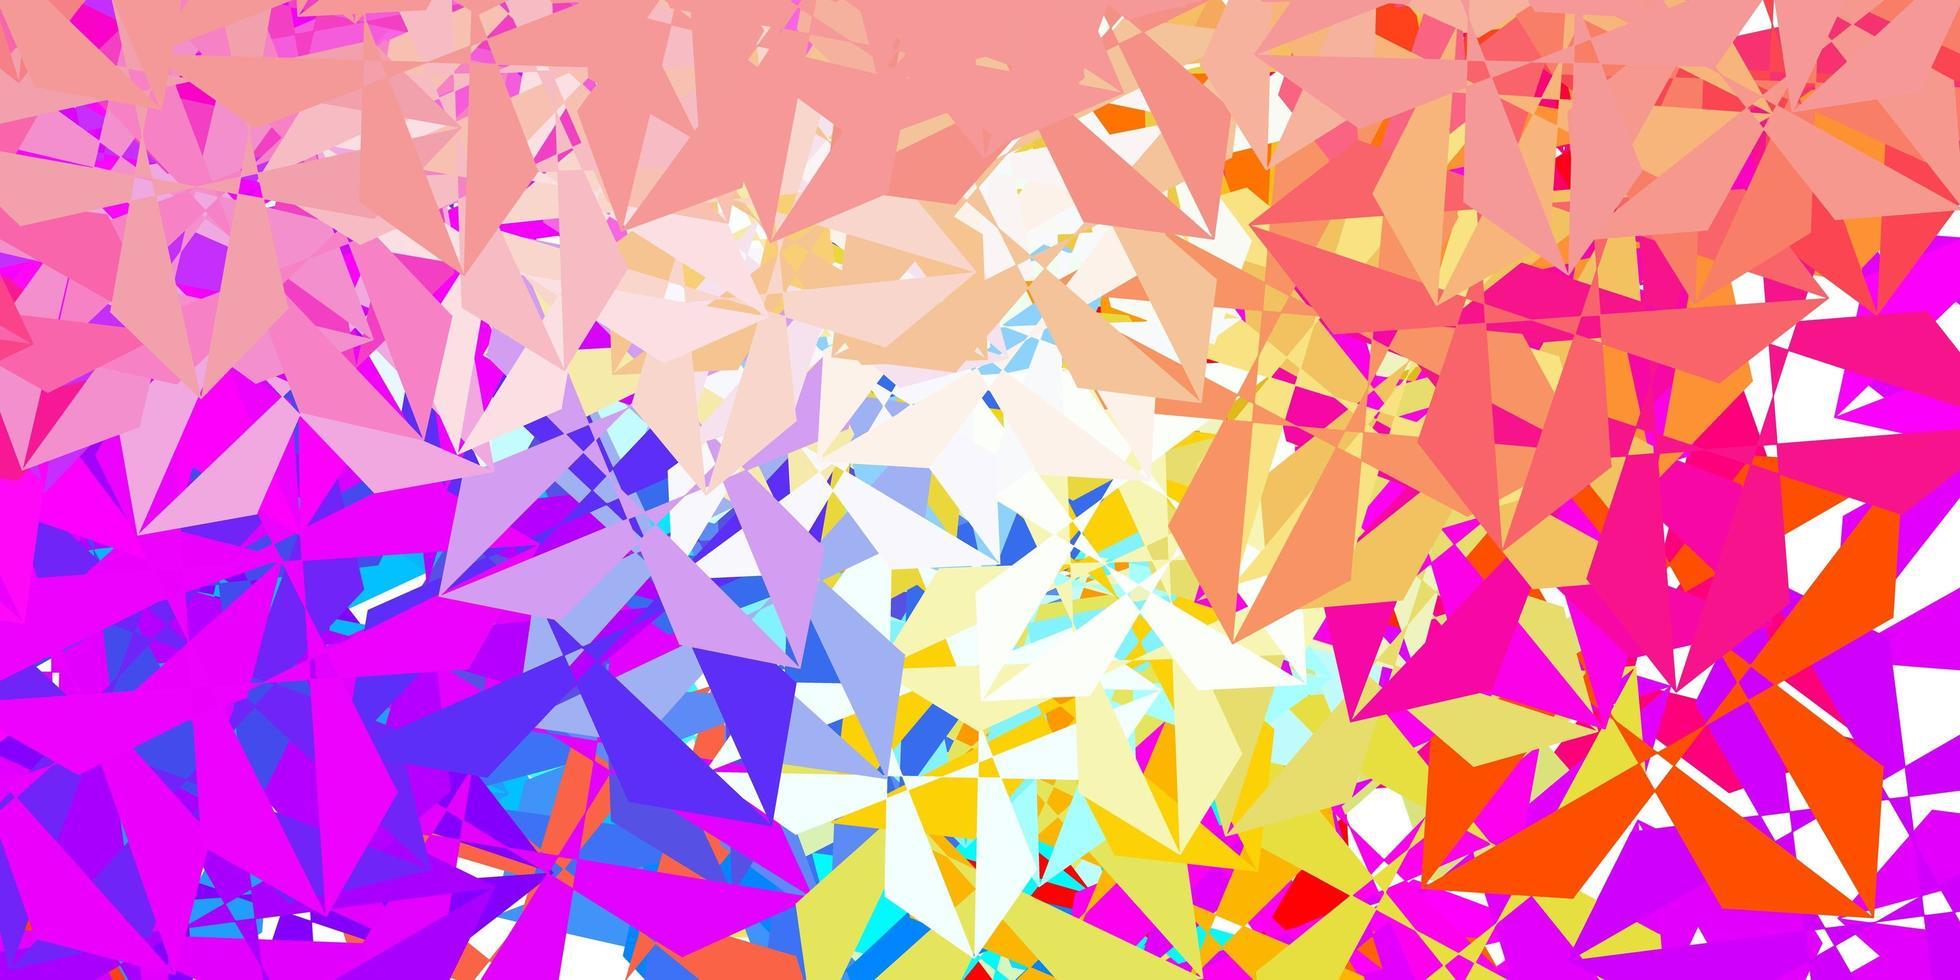 dunkelblaues, gelbes Vektor-Poly-Dreieck-Layout. vektor